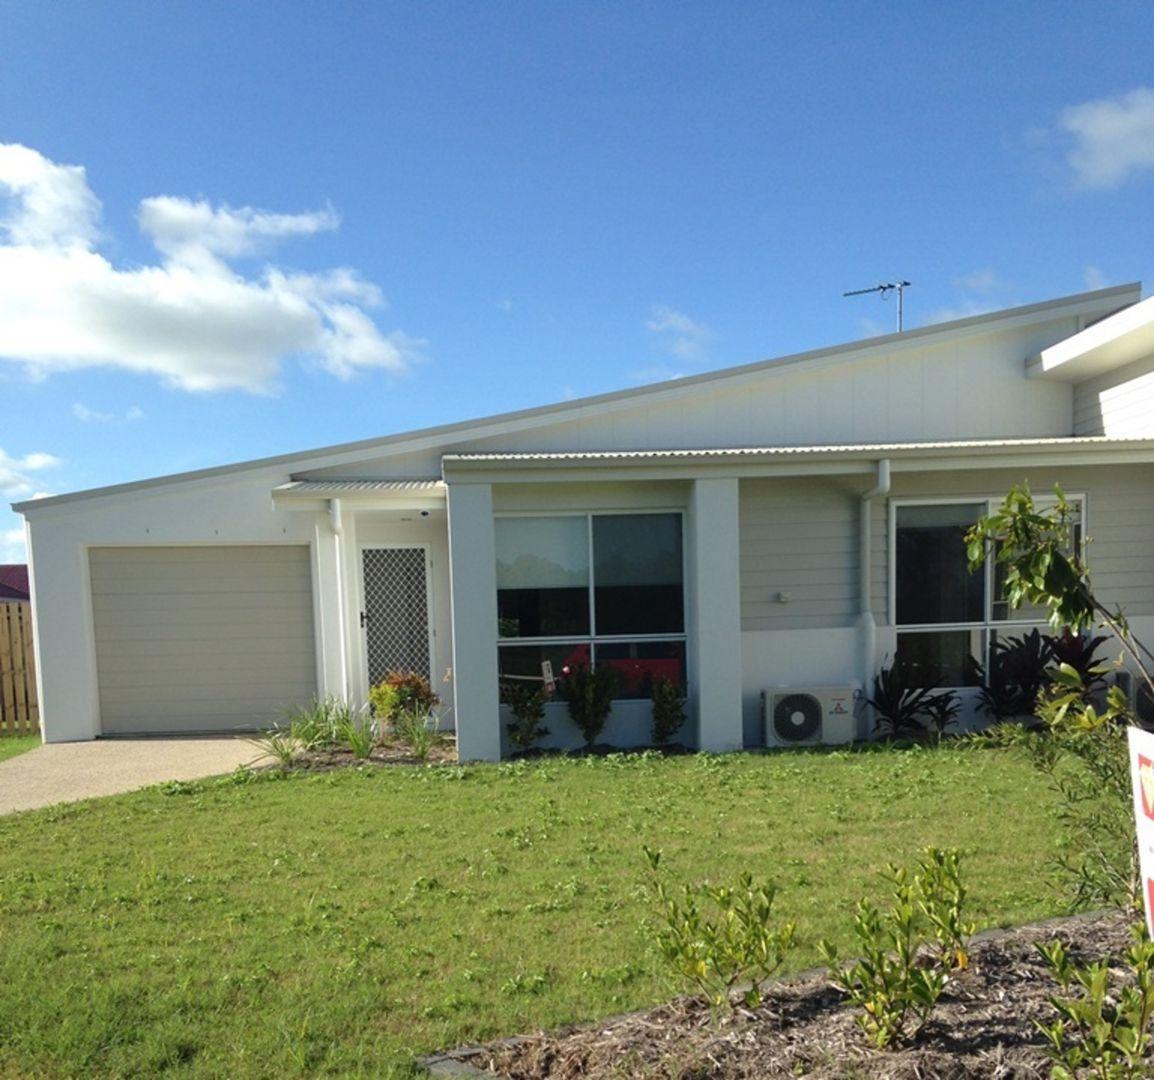 2/13 Fitzpatrick Street, Walkerston QLD 4751, Image 0